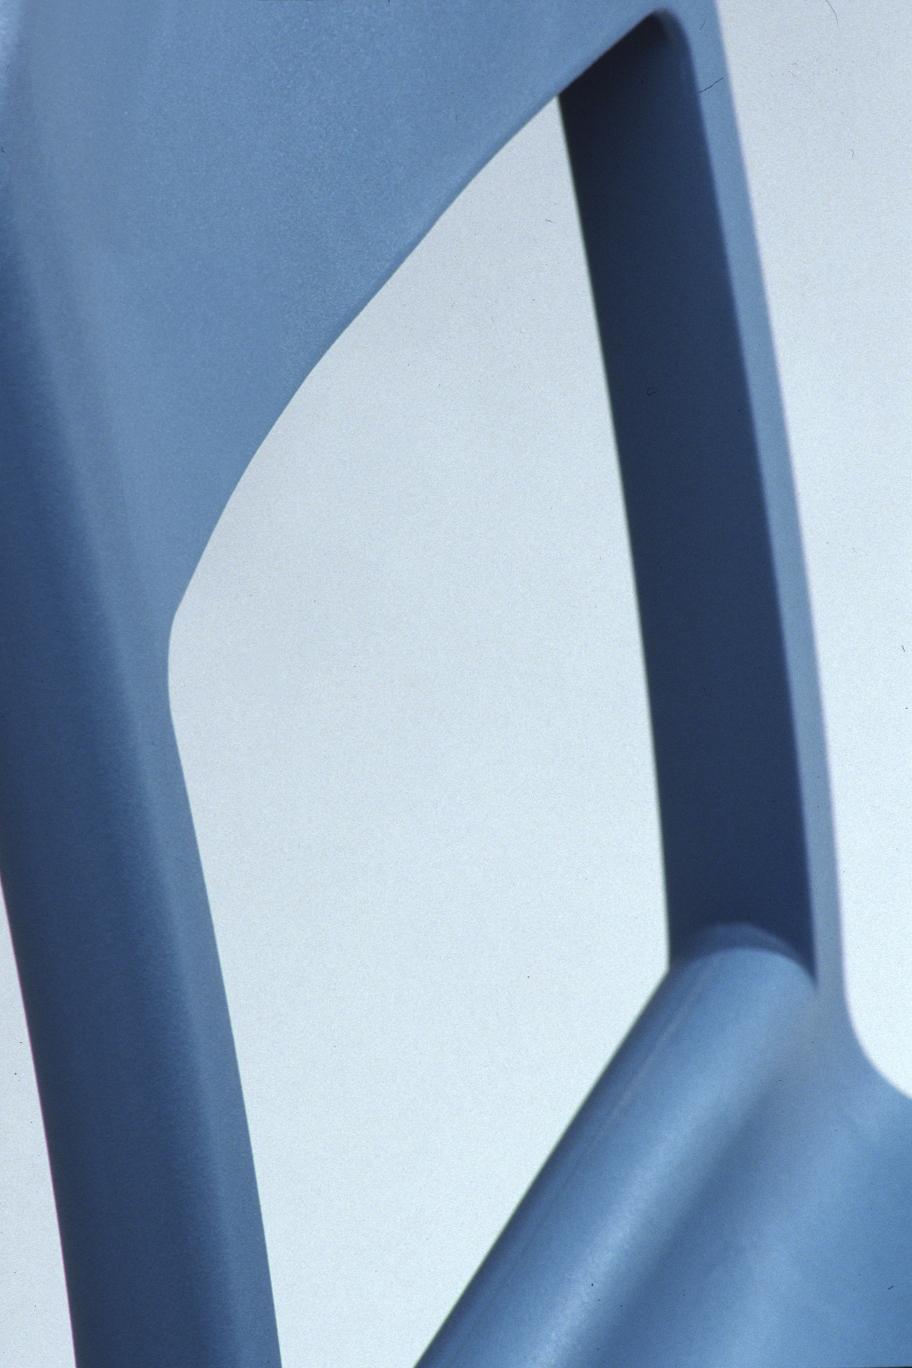 Segis_Ilviophotos_teal blue_detail.jpg